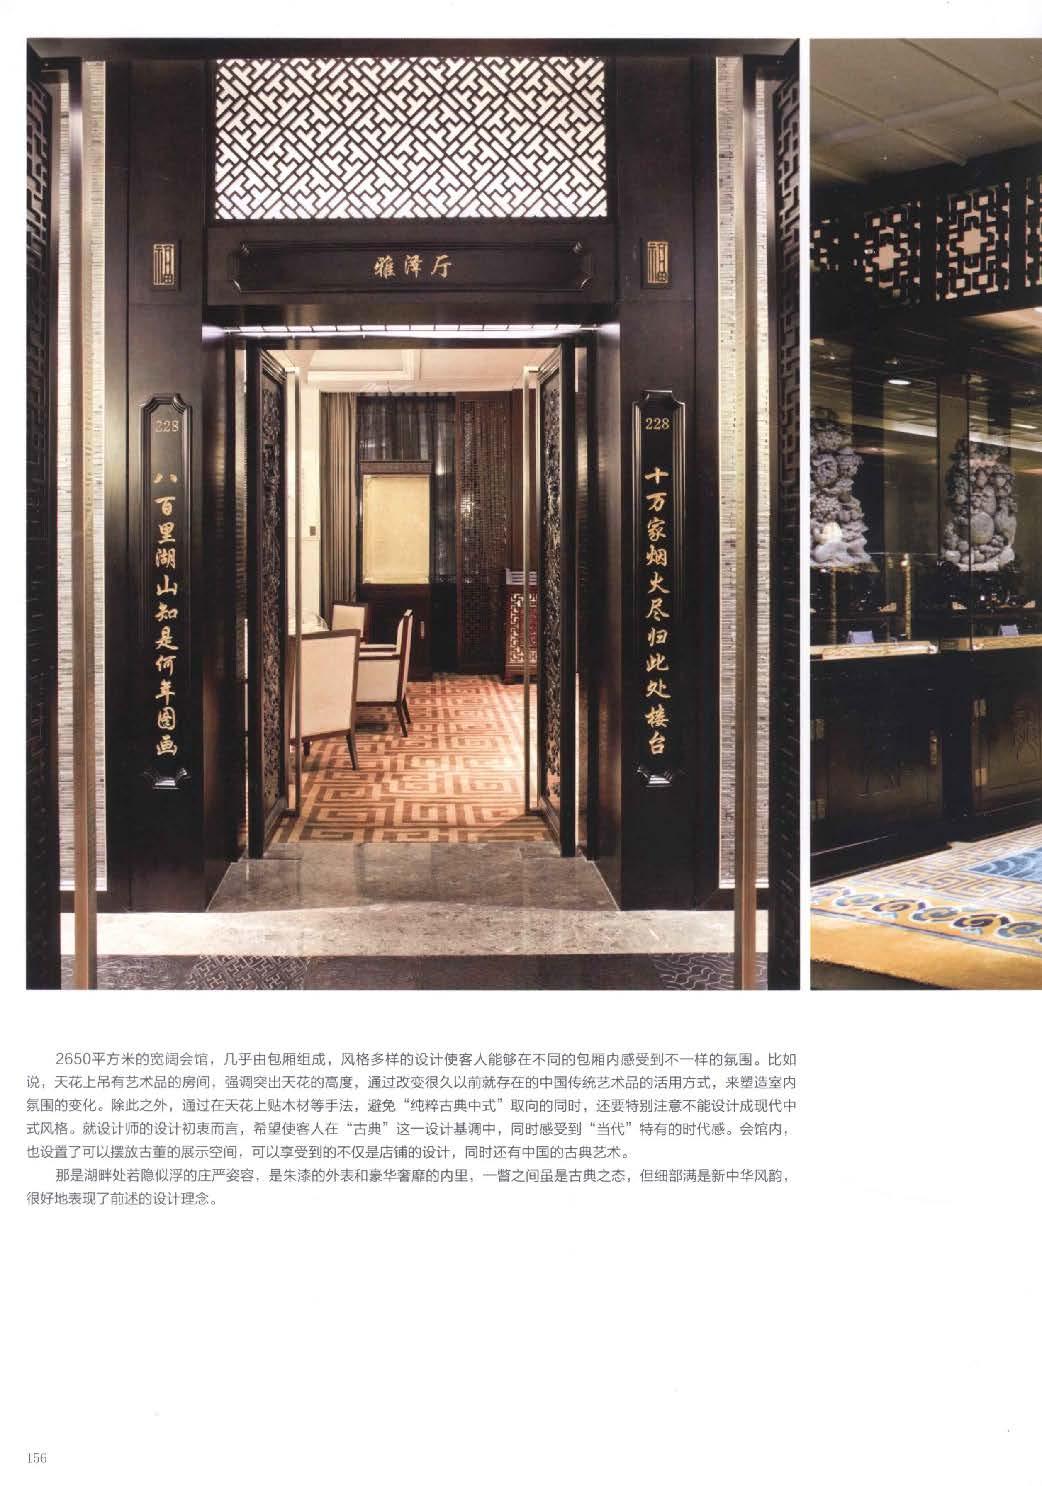 H073 东方风情 会所、餐饮细部解析_Page_154.jpg